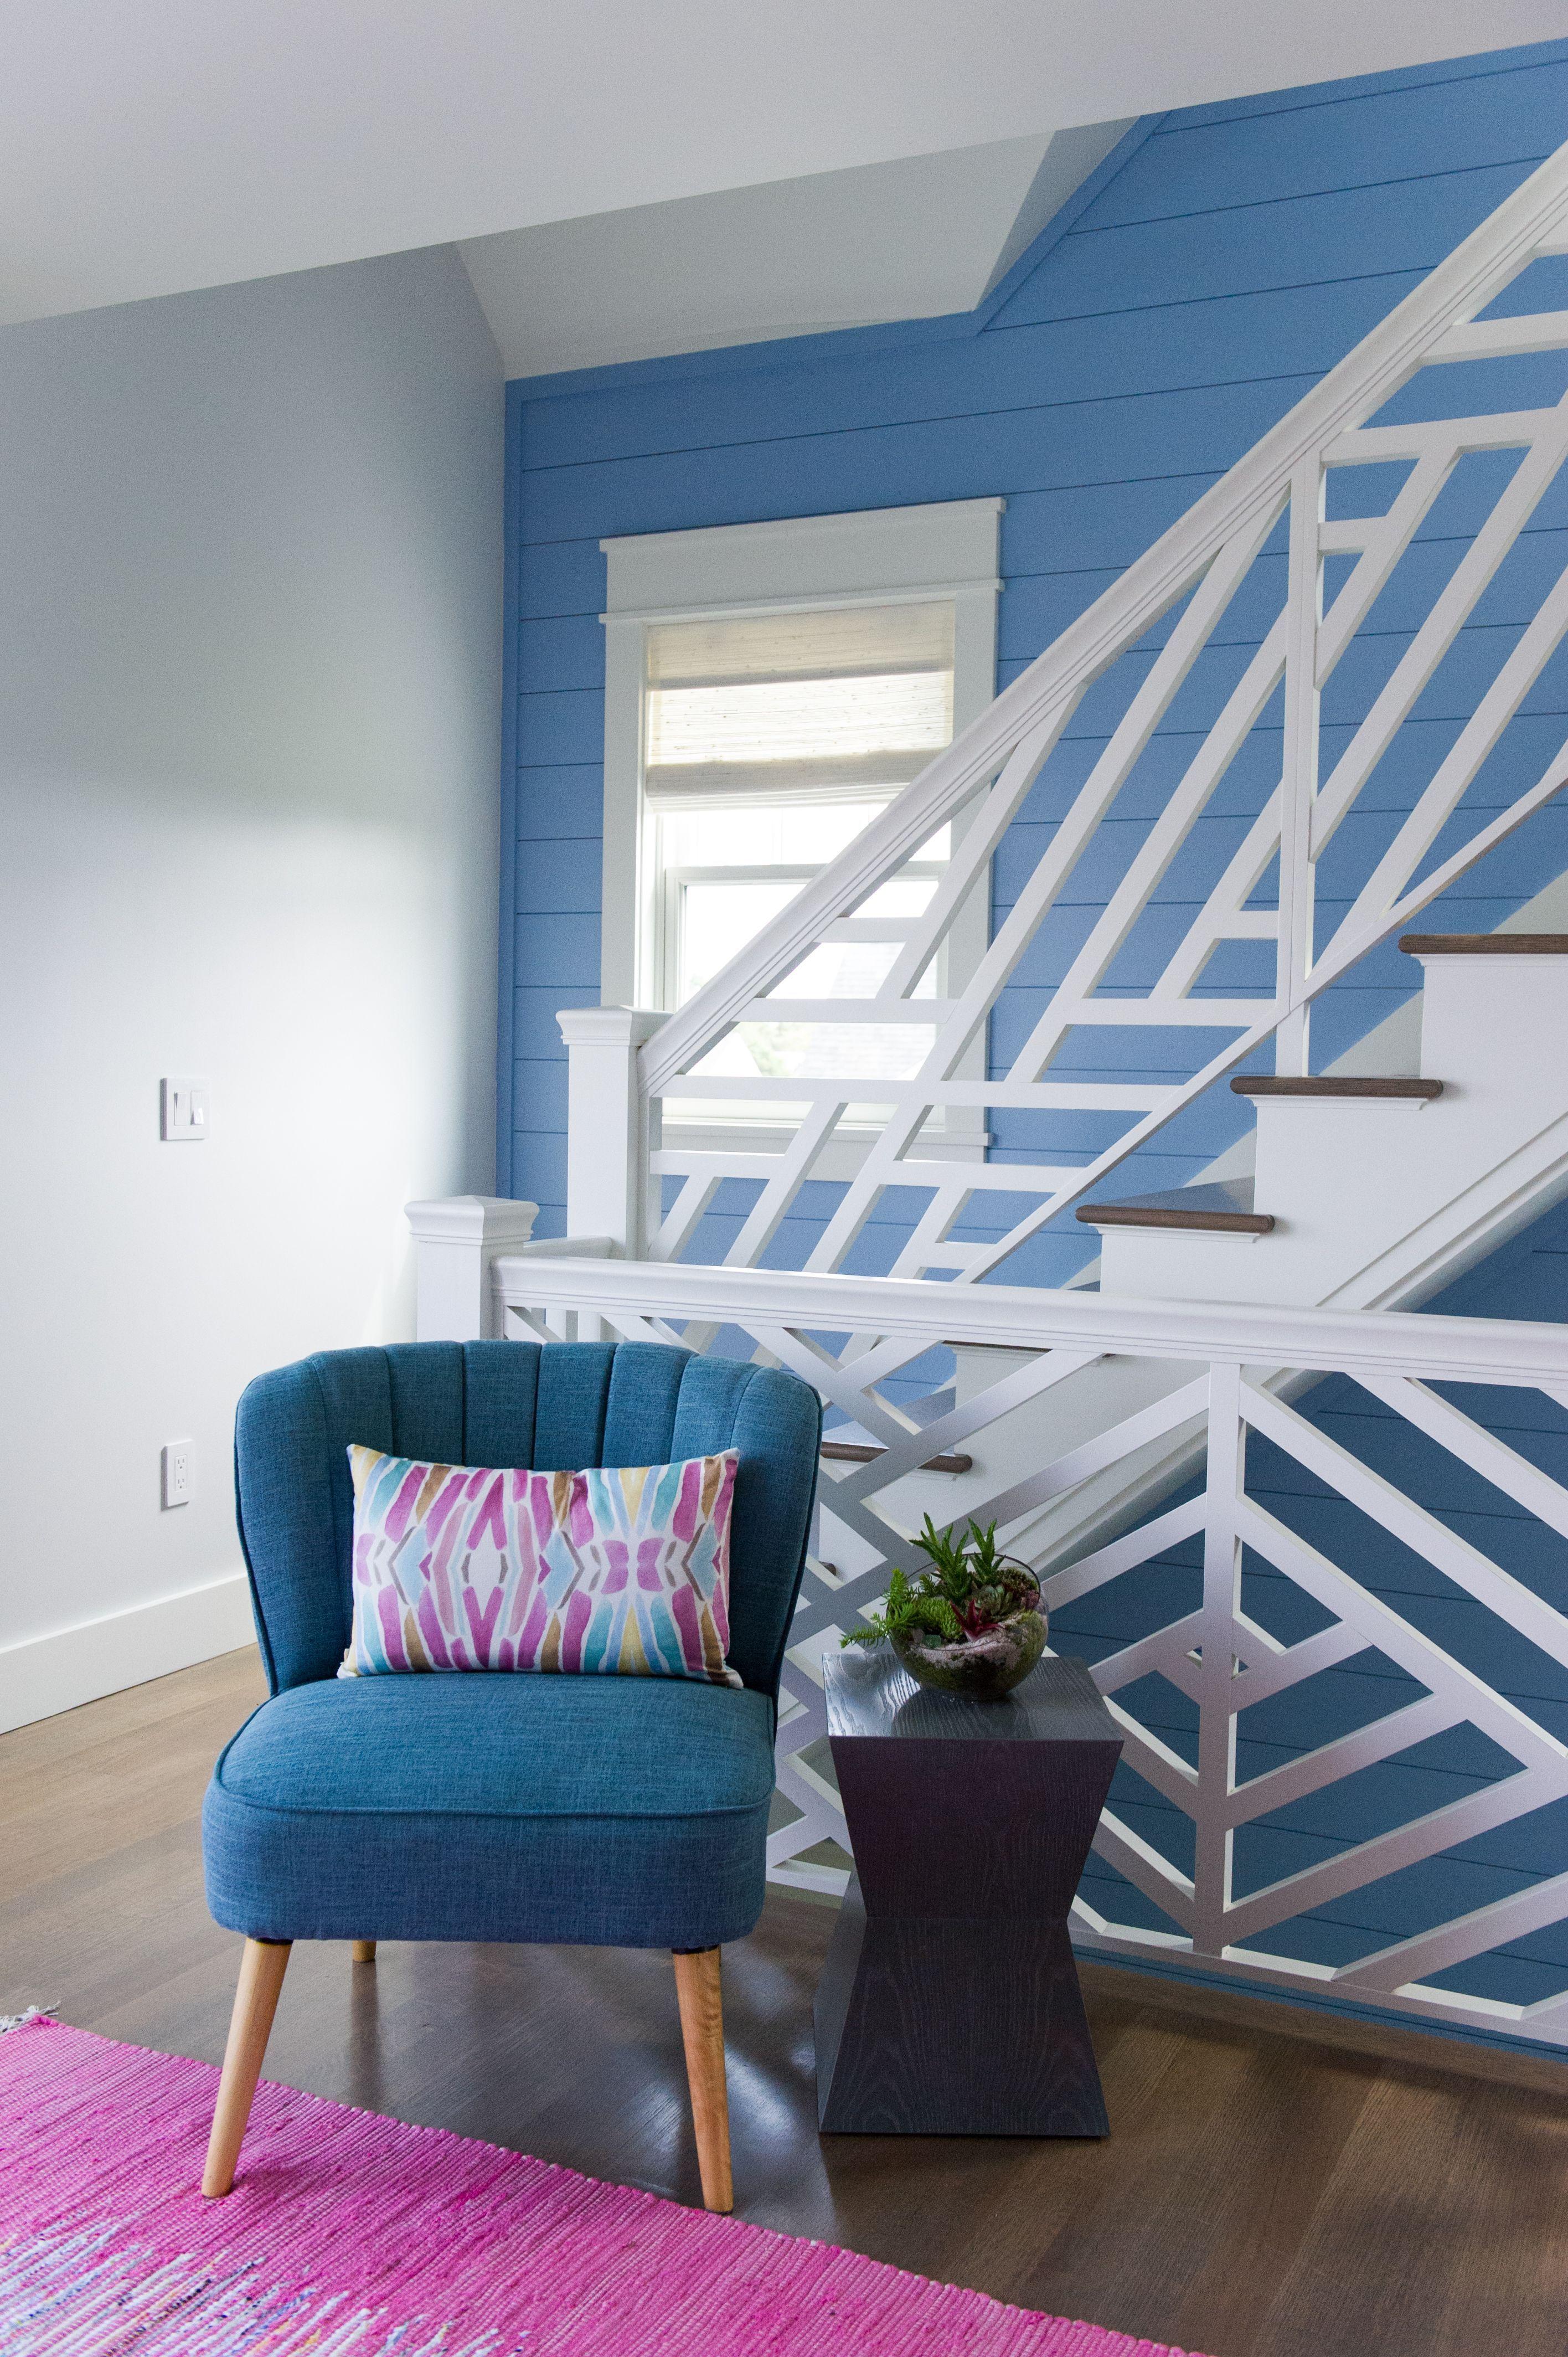 Pin By Avery Oldakowski On Accent Wall Home Decor Decor